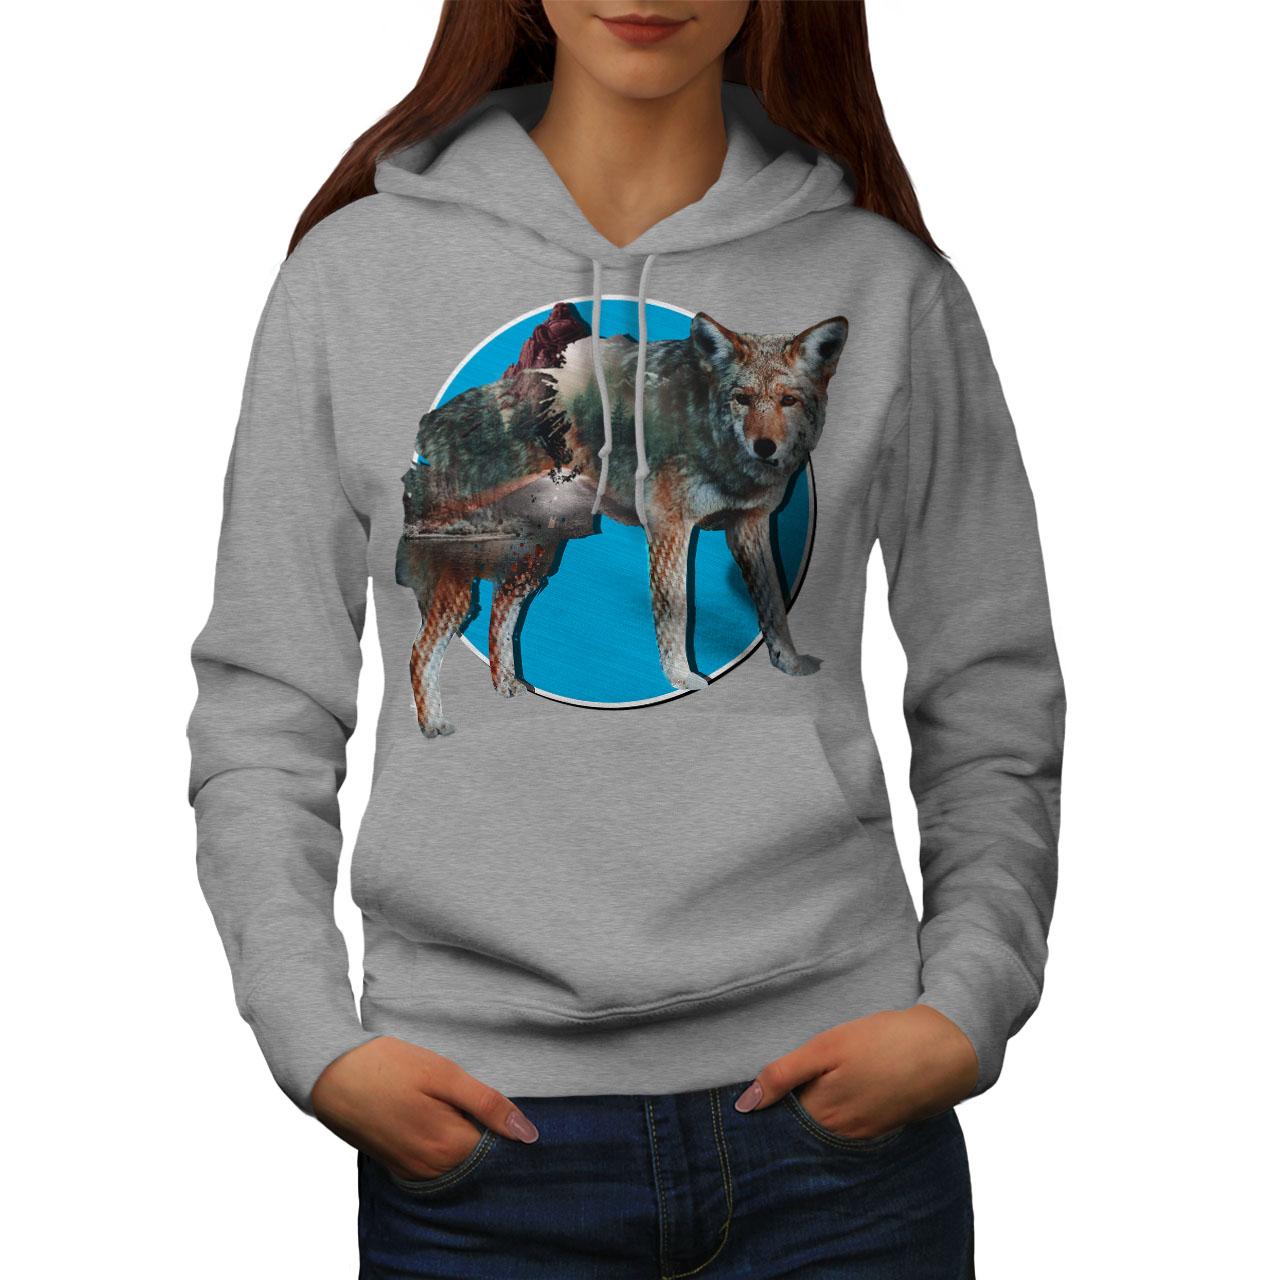 GüNstiger Verkauf Wellcoda Wolf Beast Nature Animal Womens Hoodie, Fox Casual Hooded Sweatshirt